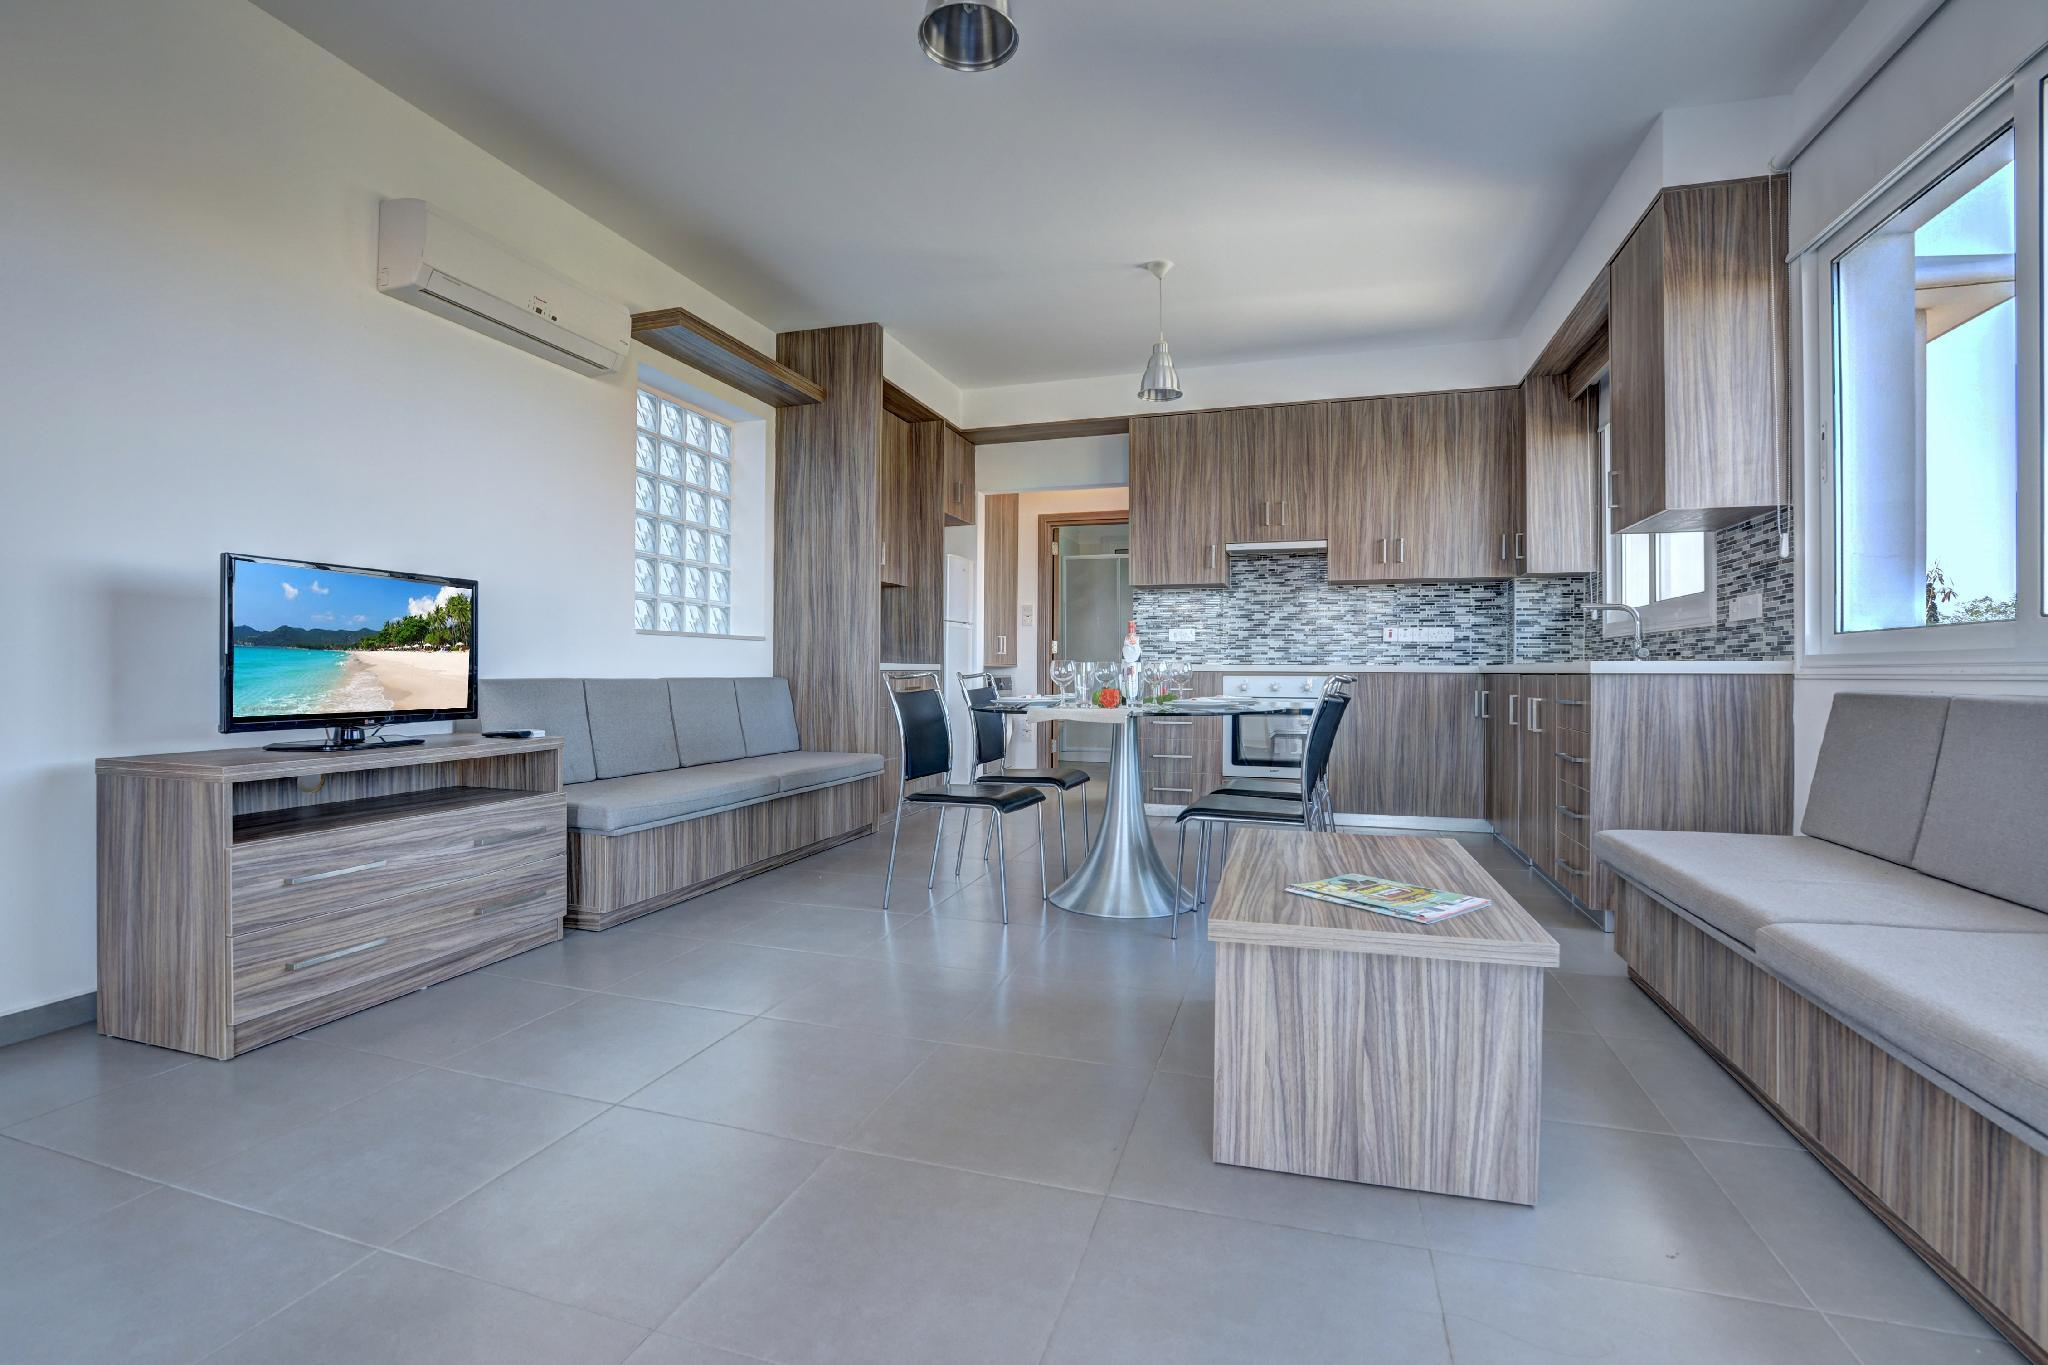 Island Villas Cyprus 010 Modern One Bedroom APT